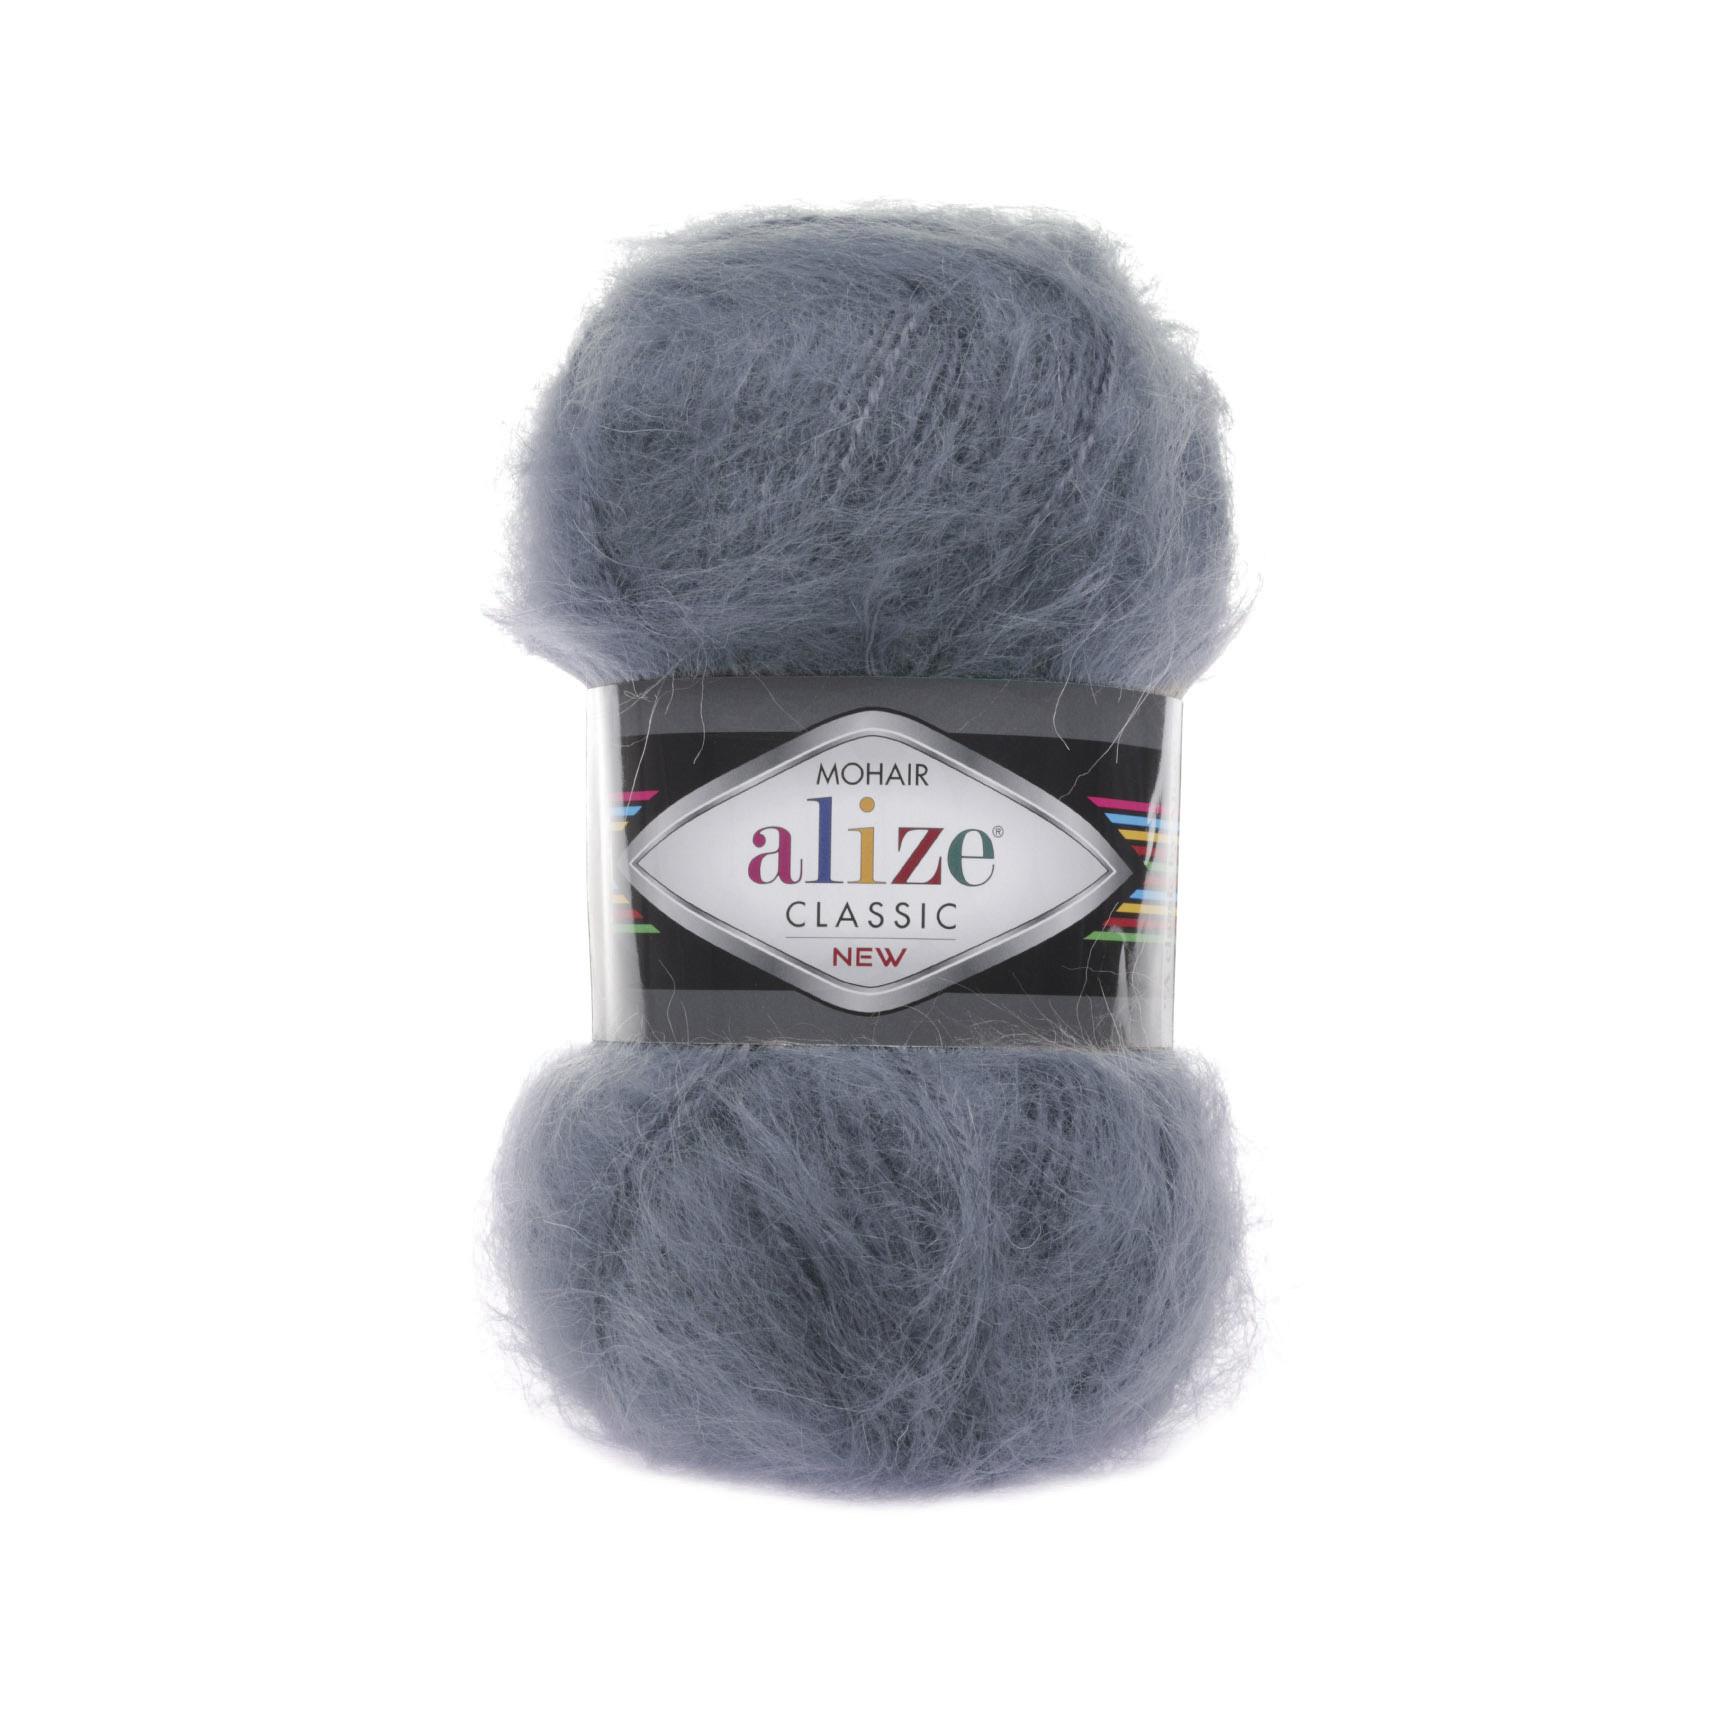 Пряжа Alize Mohair Classic New 87 темно-серый